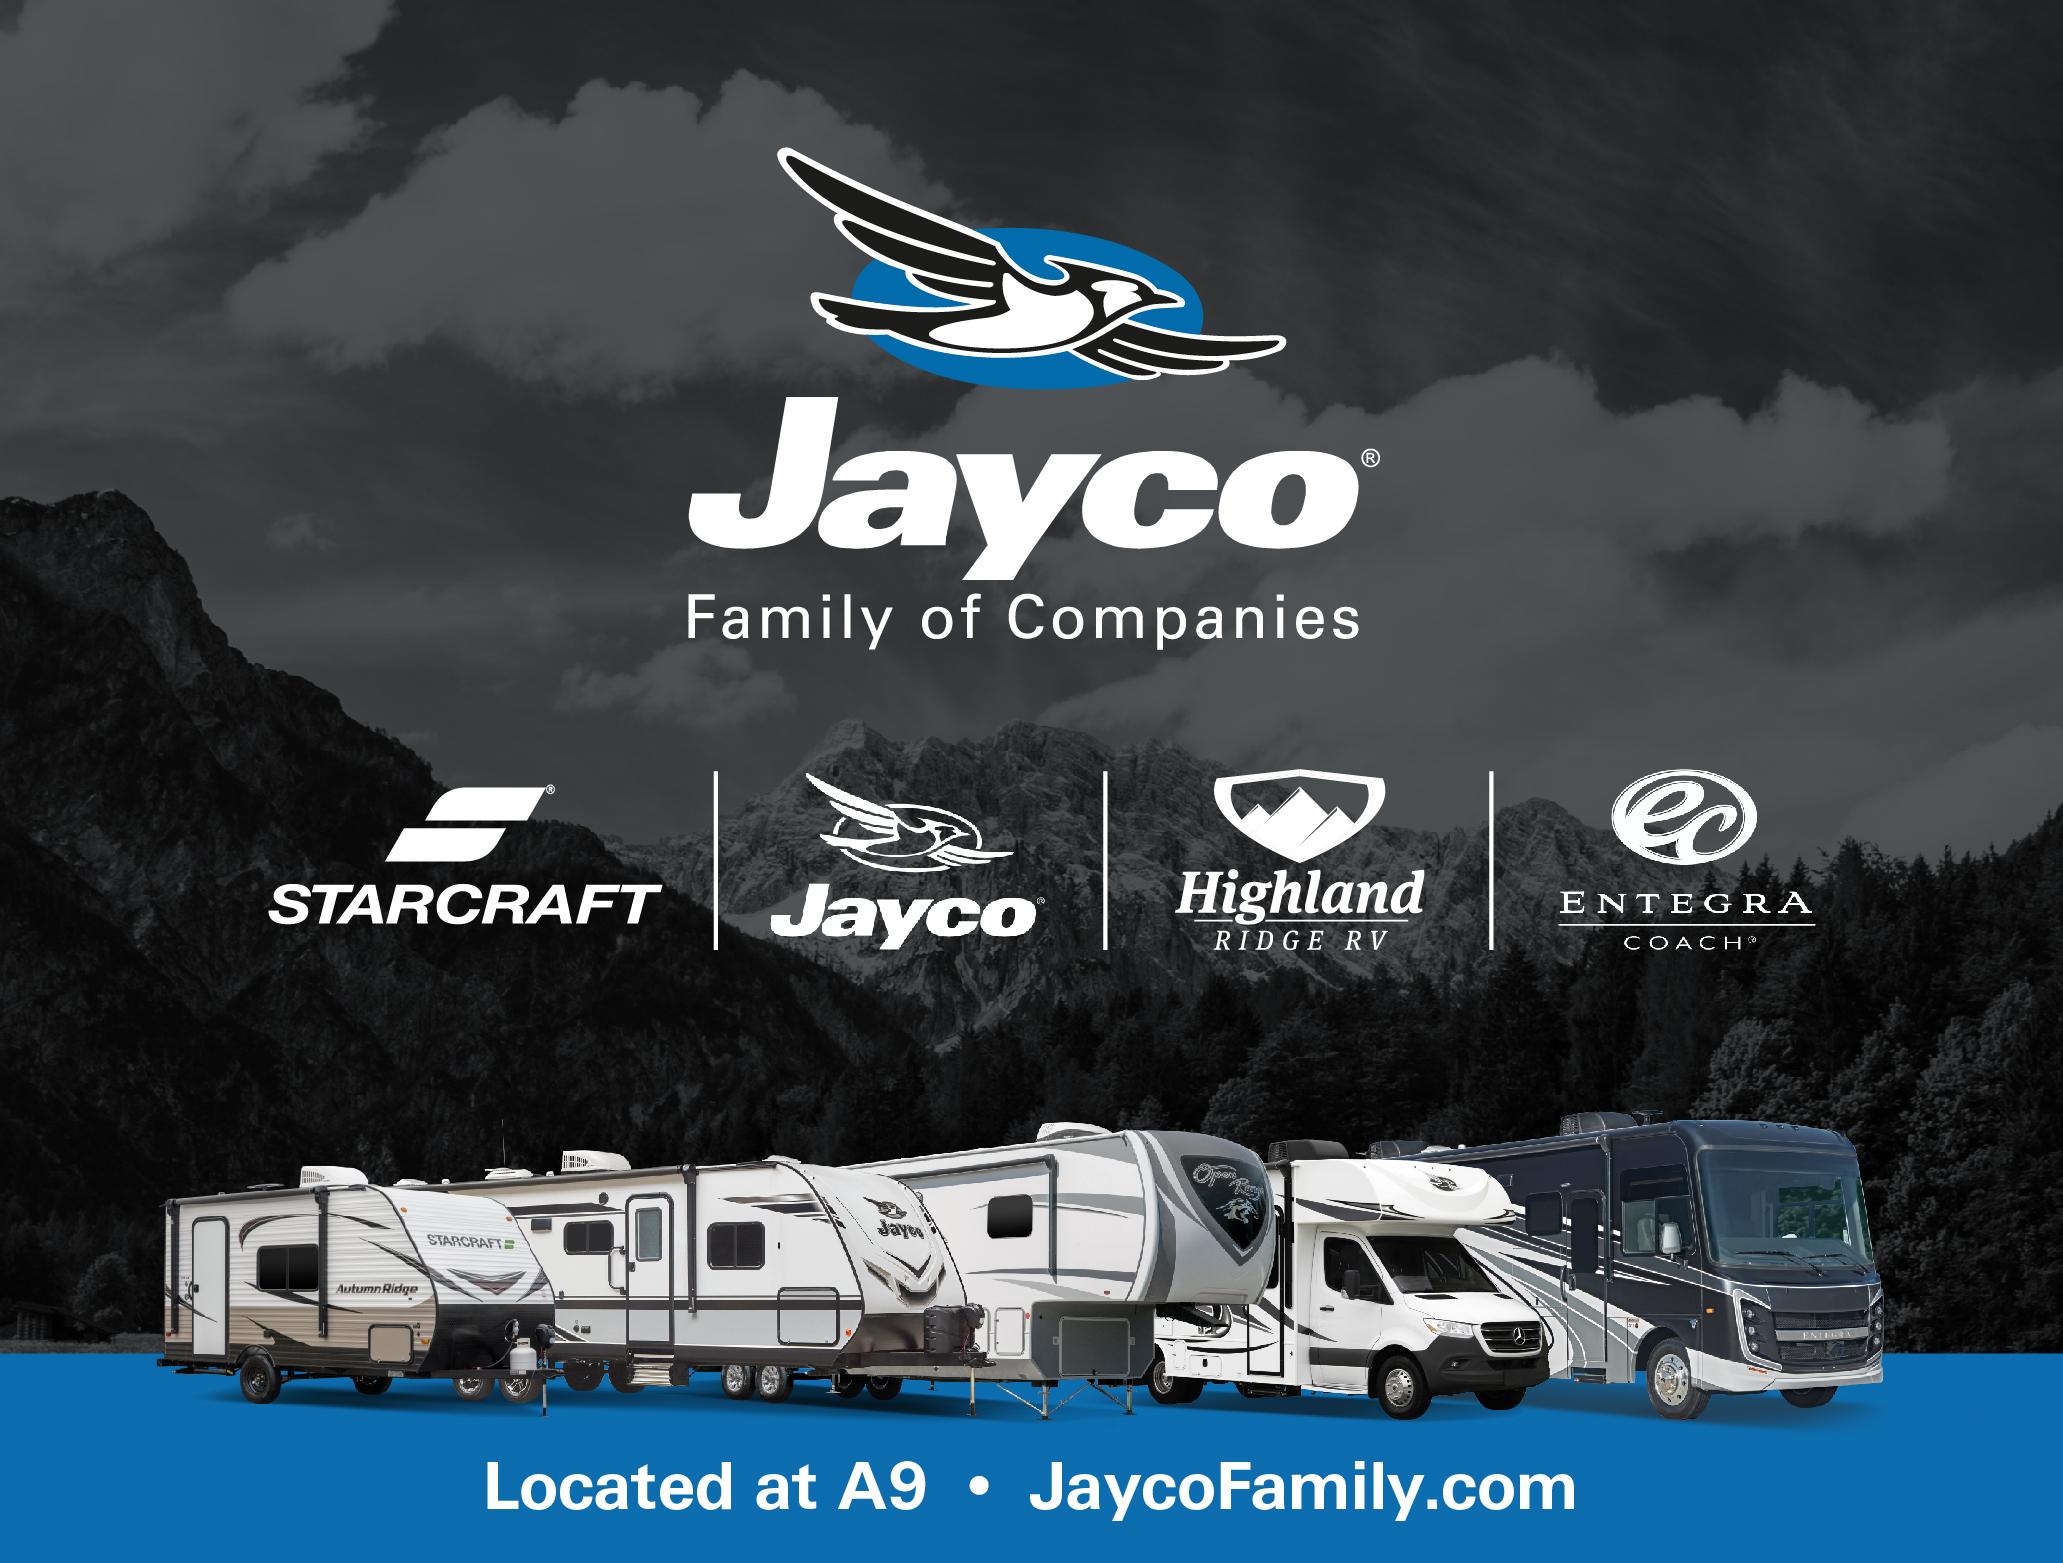 Jayco Family of Companies